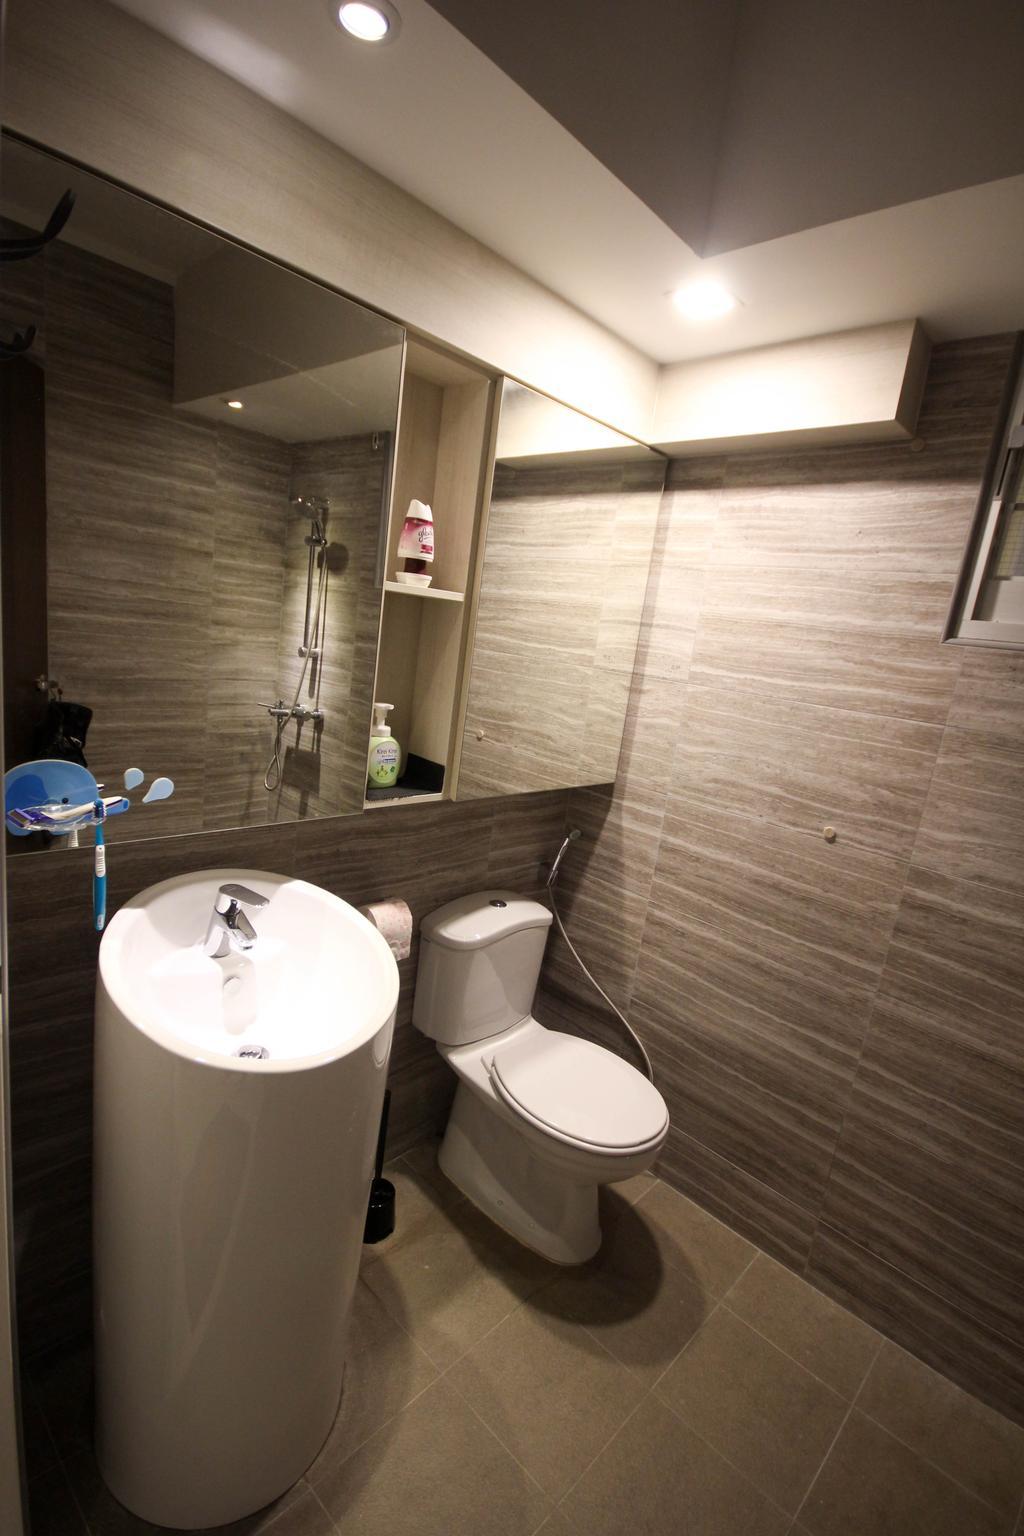 Transitional, HDB, Bathroom, Upper Serangoon Crescent, Interior Designer, The Two Big Guys, Brown Tiles, Water Closet, Standing Sink, Round Sink, Basin, Standing Basin, Toilet, Indoors, Interior Design, Room